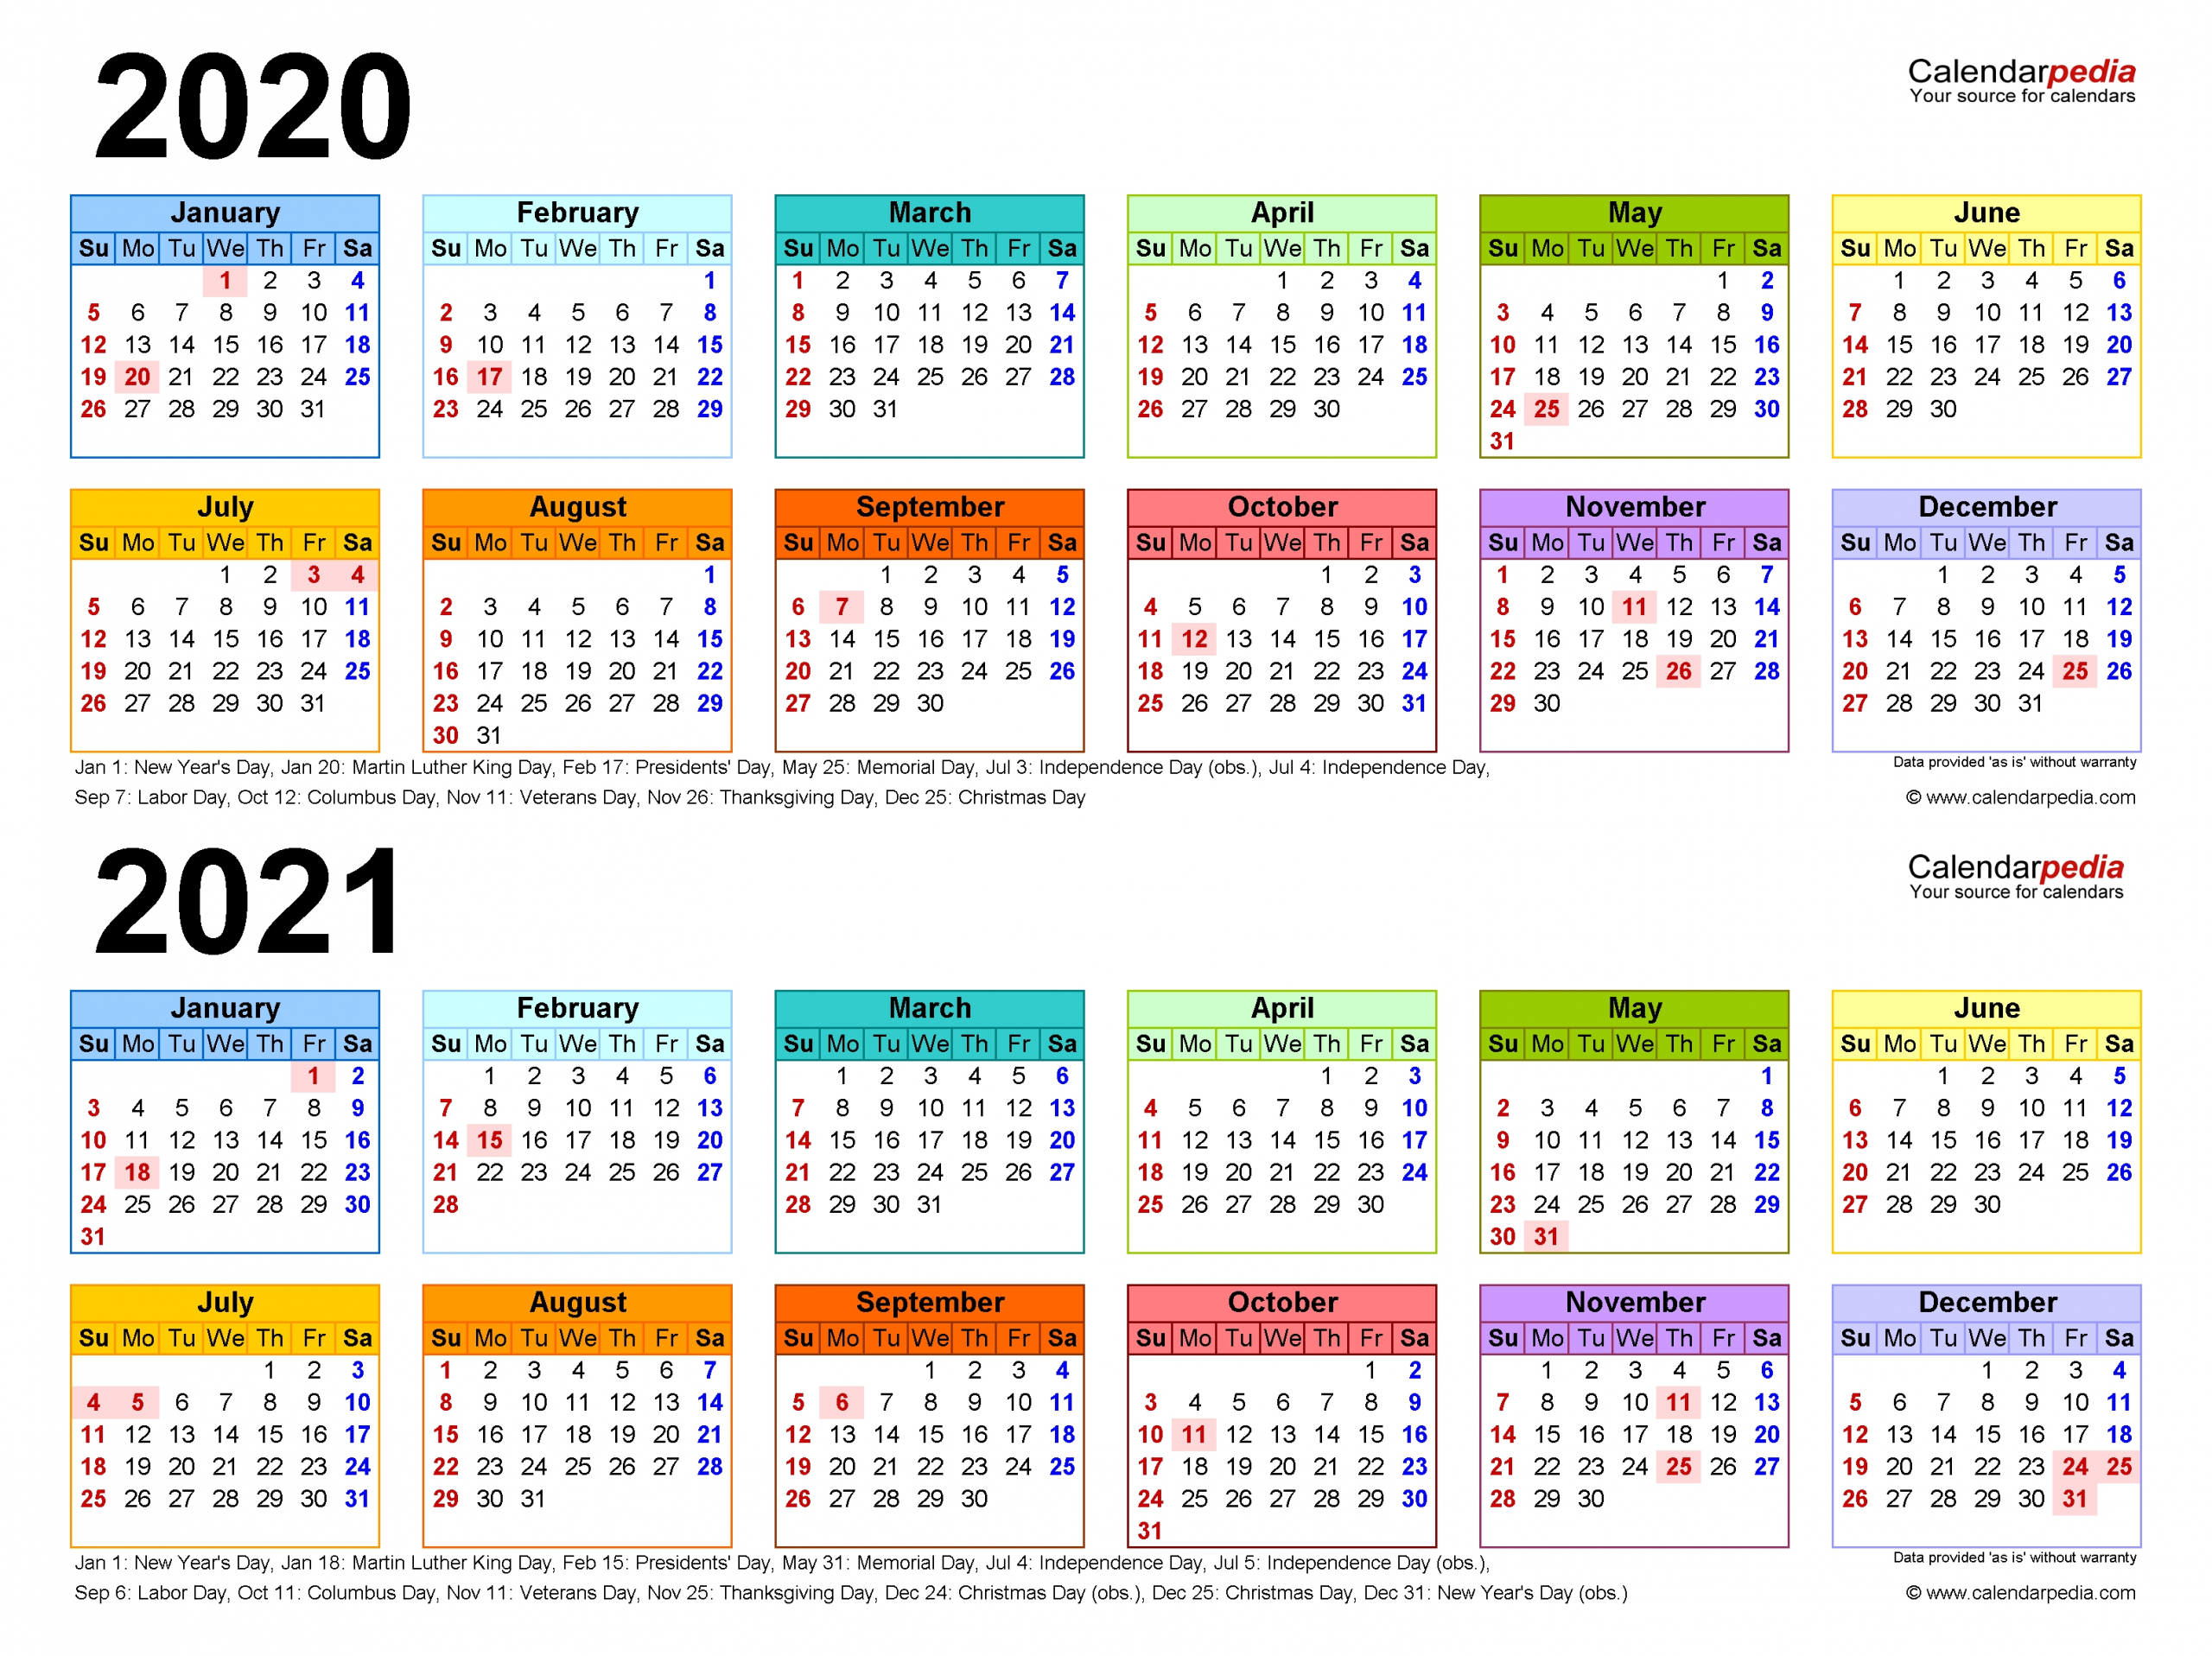 Collect قوالب كلندر 2021 شهرية 9 10 11 12